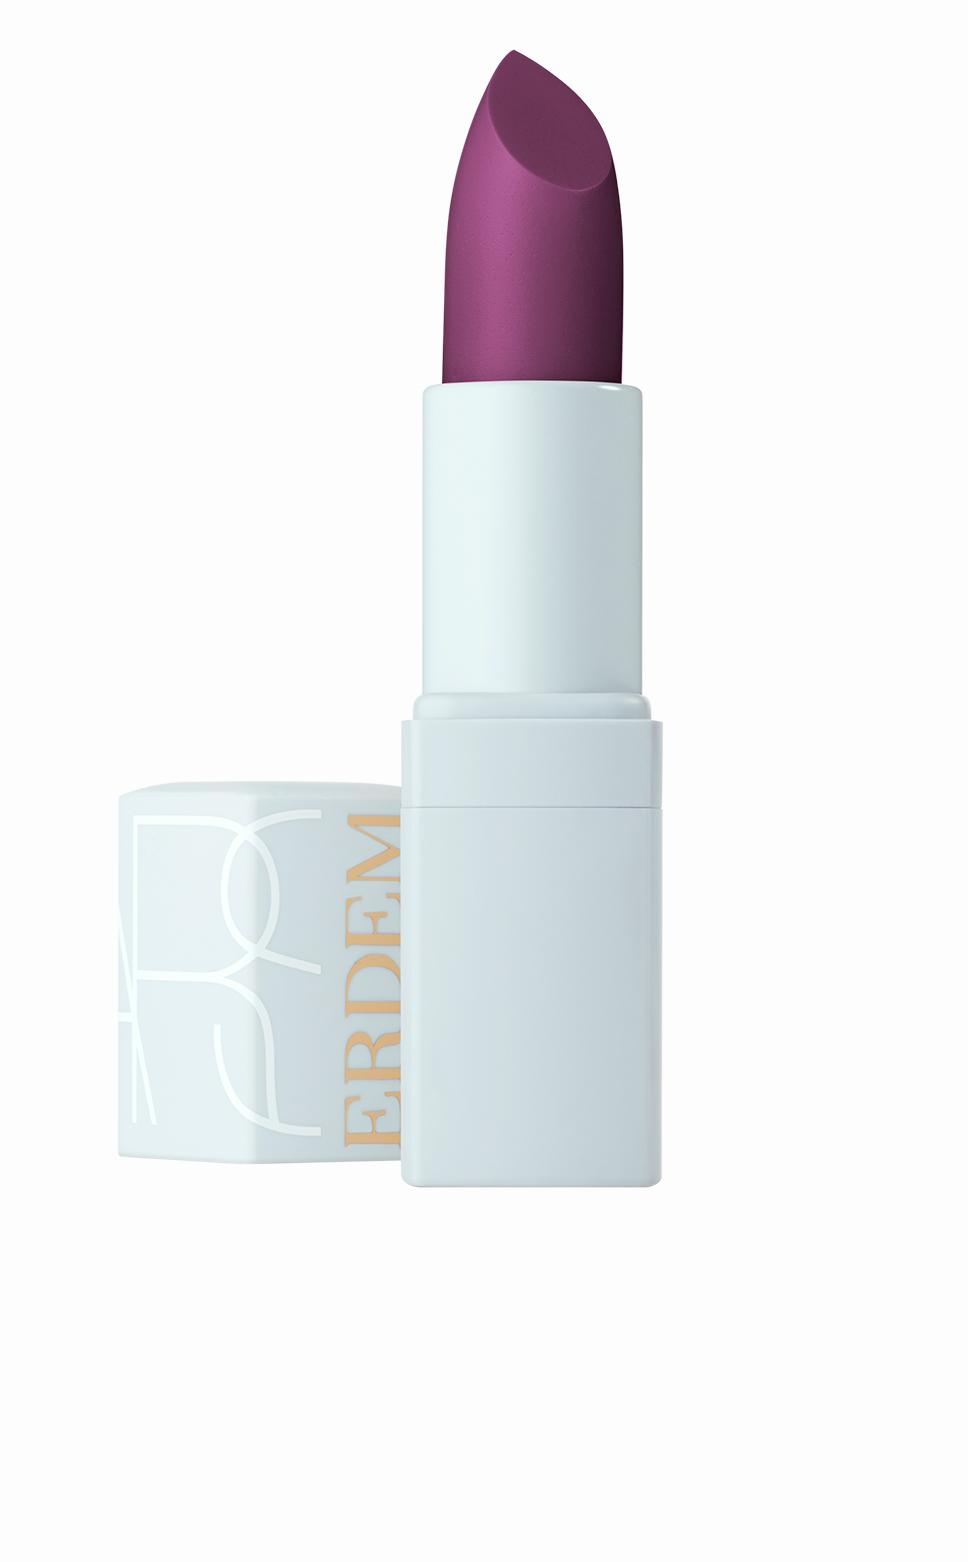 mỹ phẩm giới hạn Larkspur Lipstick